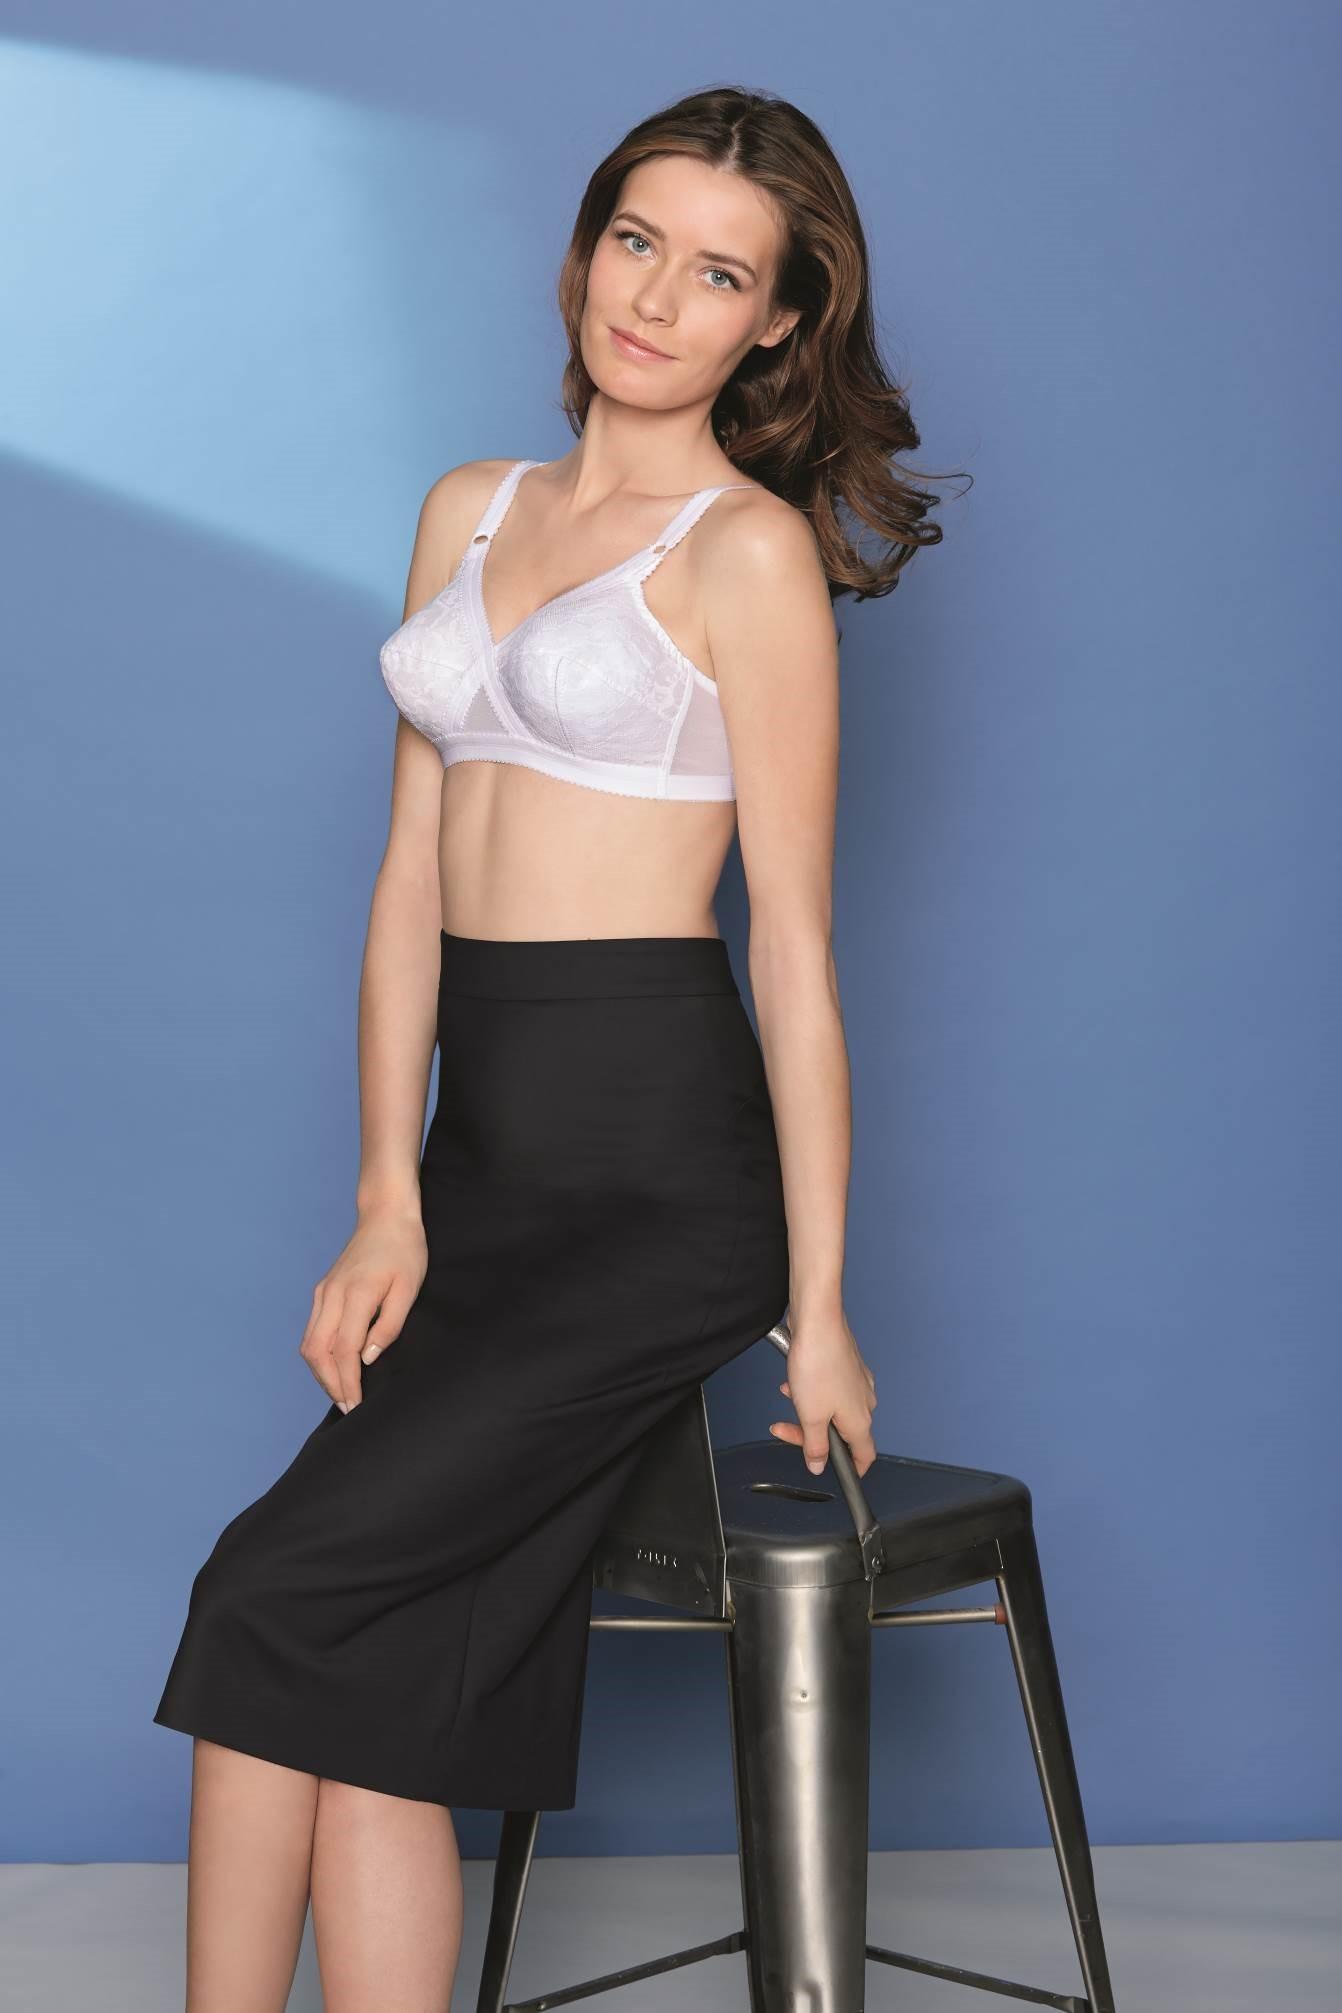 playtex coeur crois soutien gorge sans armatures femme blanc 120bb v tements. Black Bedroom Furniture Sets. Home Design Ideas